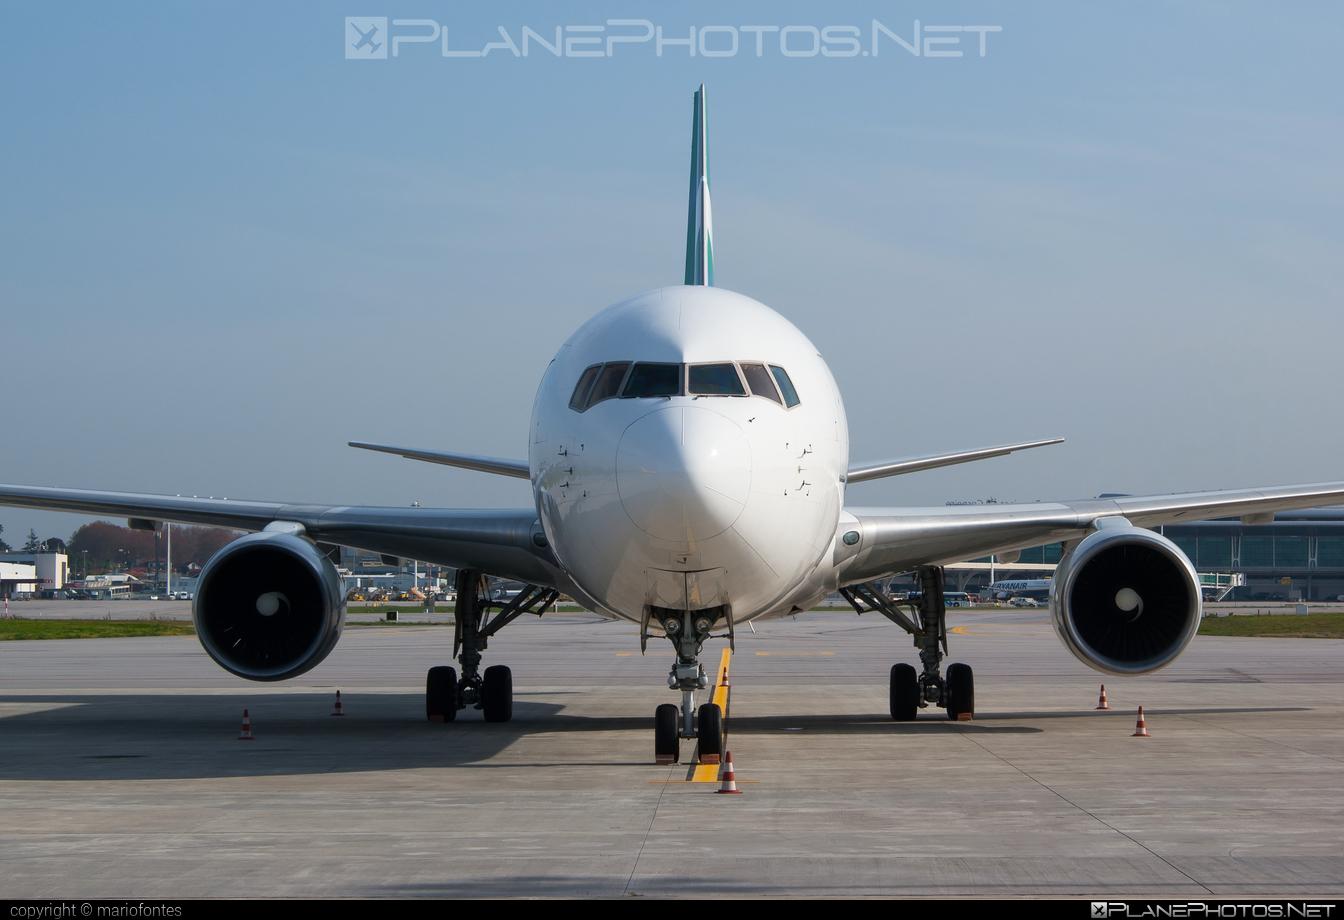 Boeing 767-300ER - CS-TRN operated by EuroAtlantic Airways #b767 #b767er #boeing #boeing767 #euroatlantic #euroatlanticairways